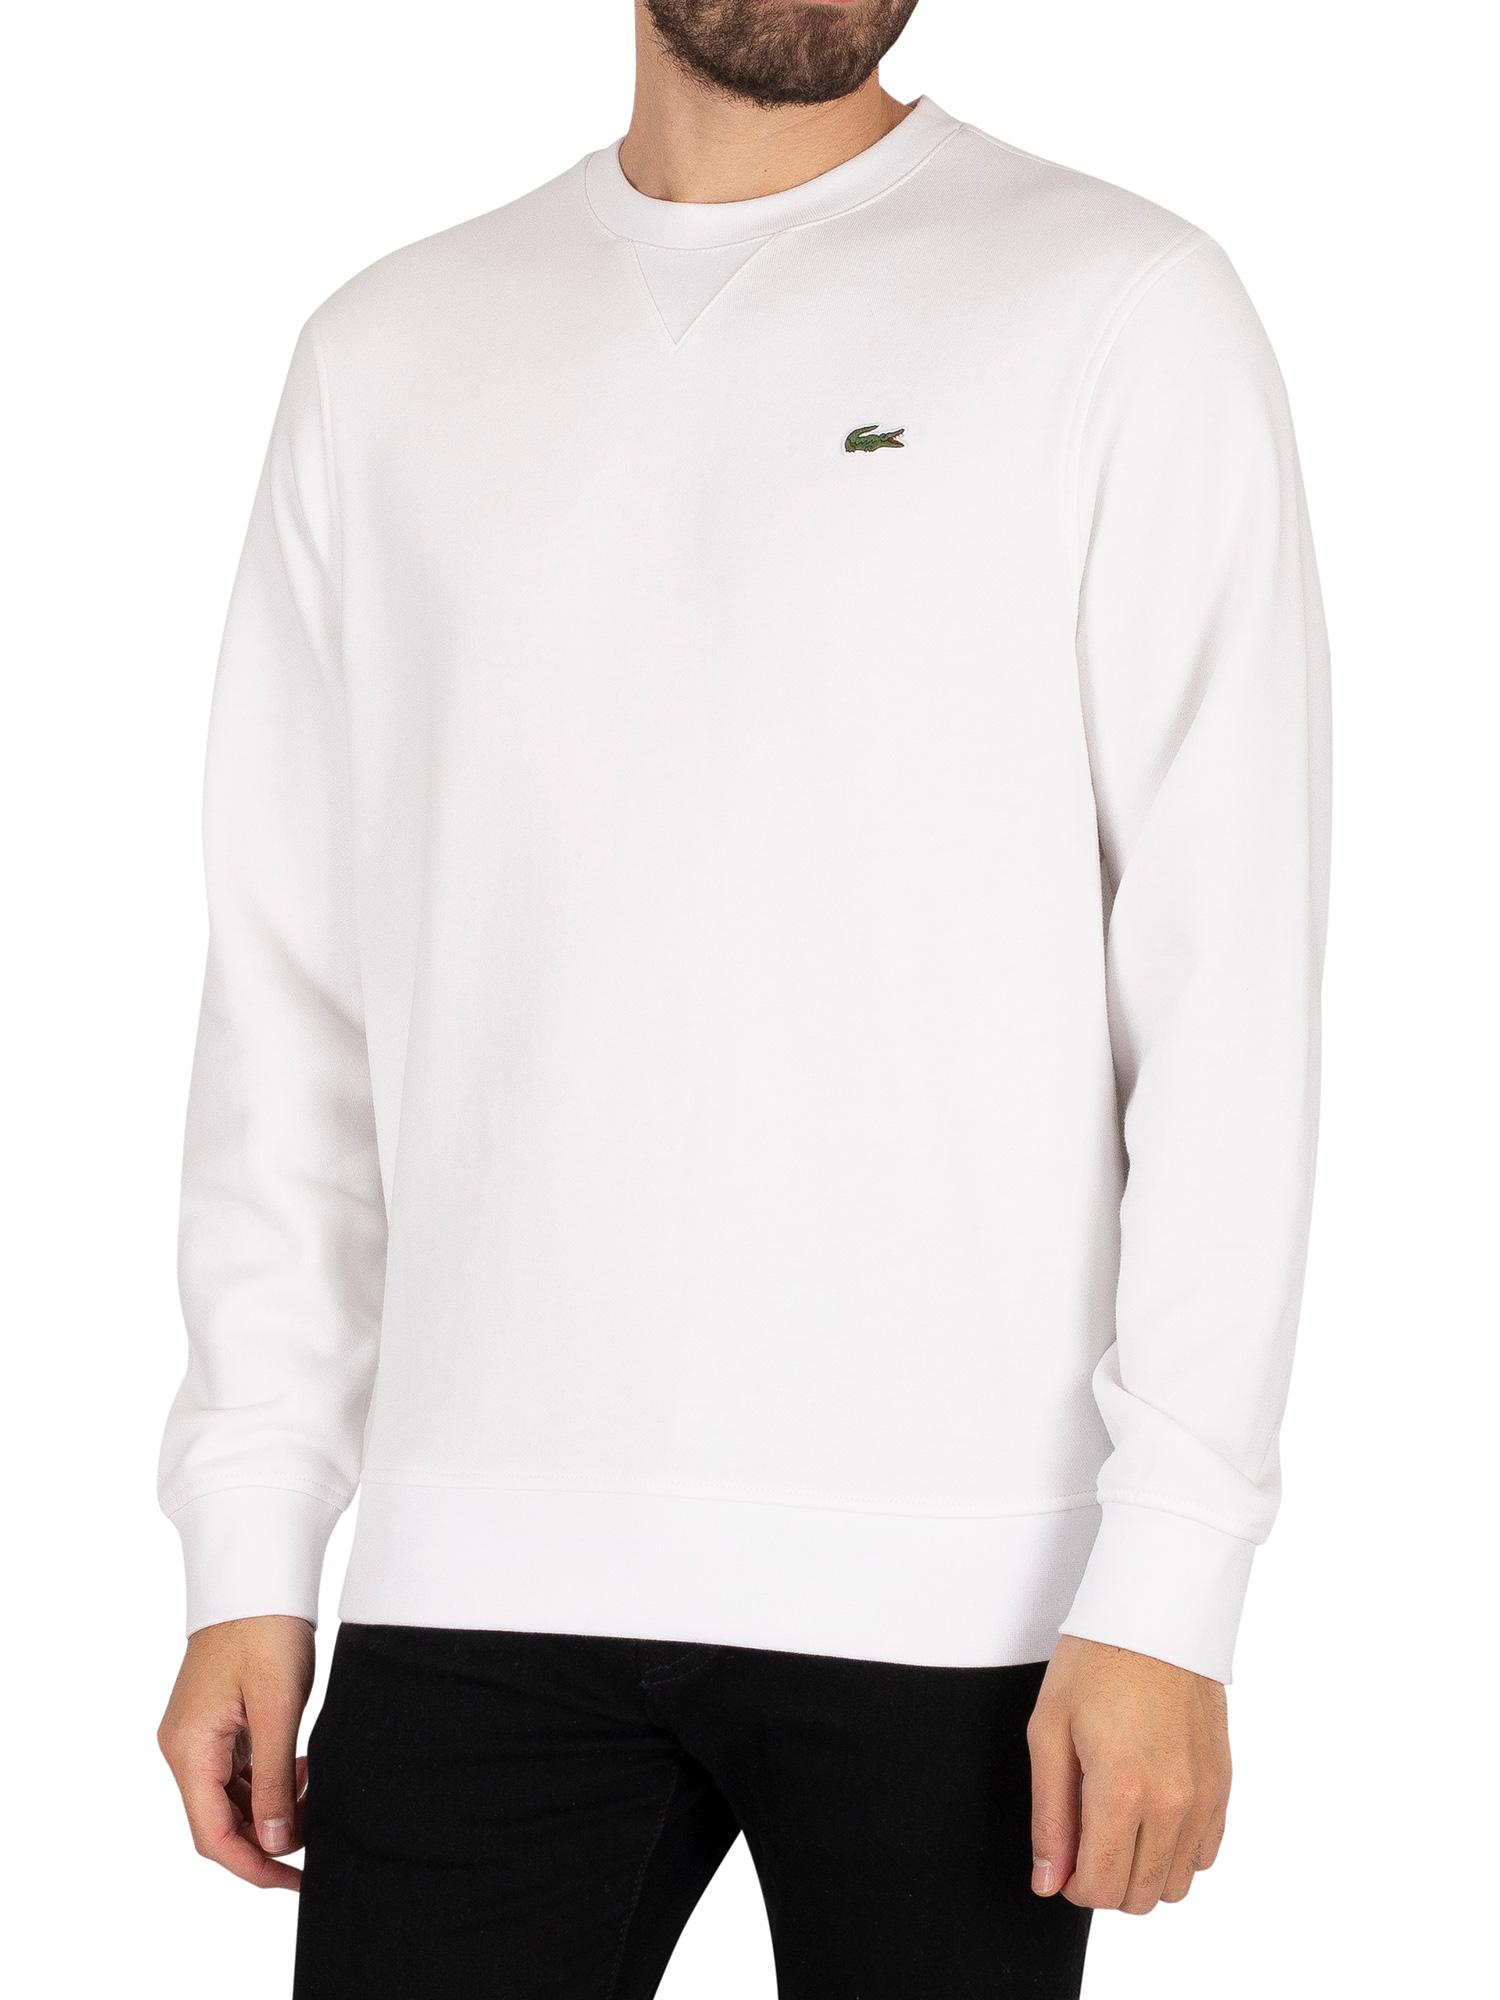 Sport Cotton Blend Fleece Sweatshirt